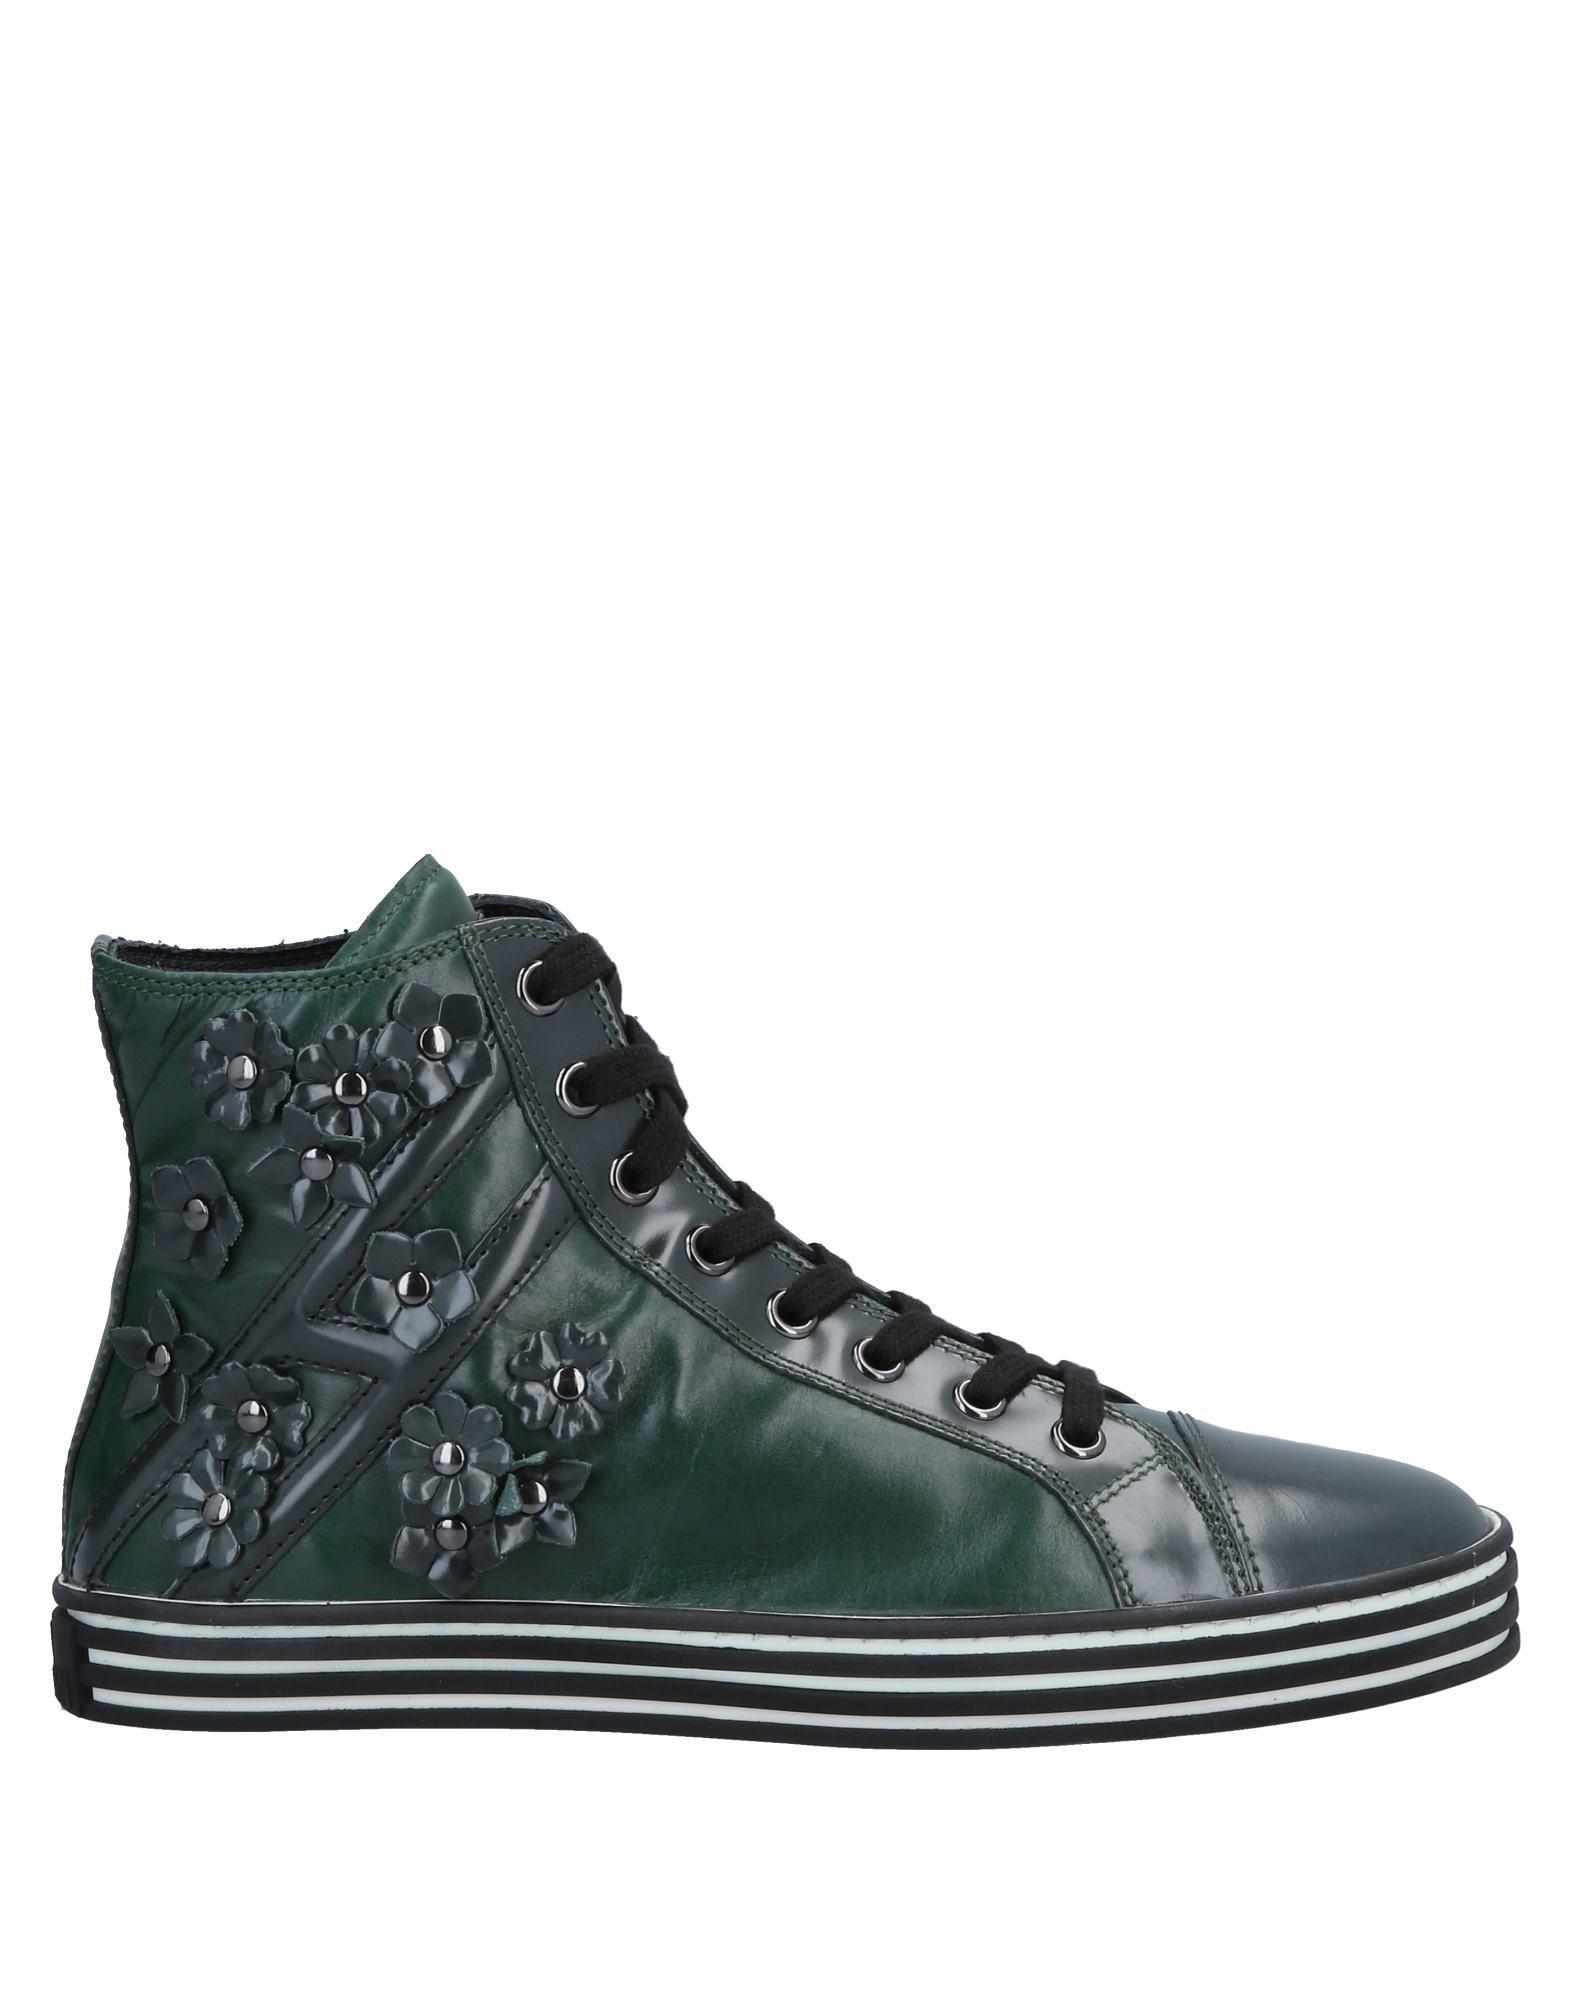 8746d217dcd Hogan Rebel High-tops   Sneakers in Green - Lyst